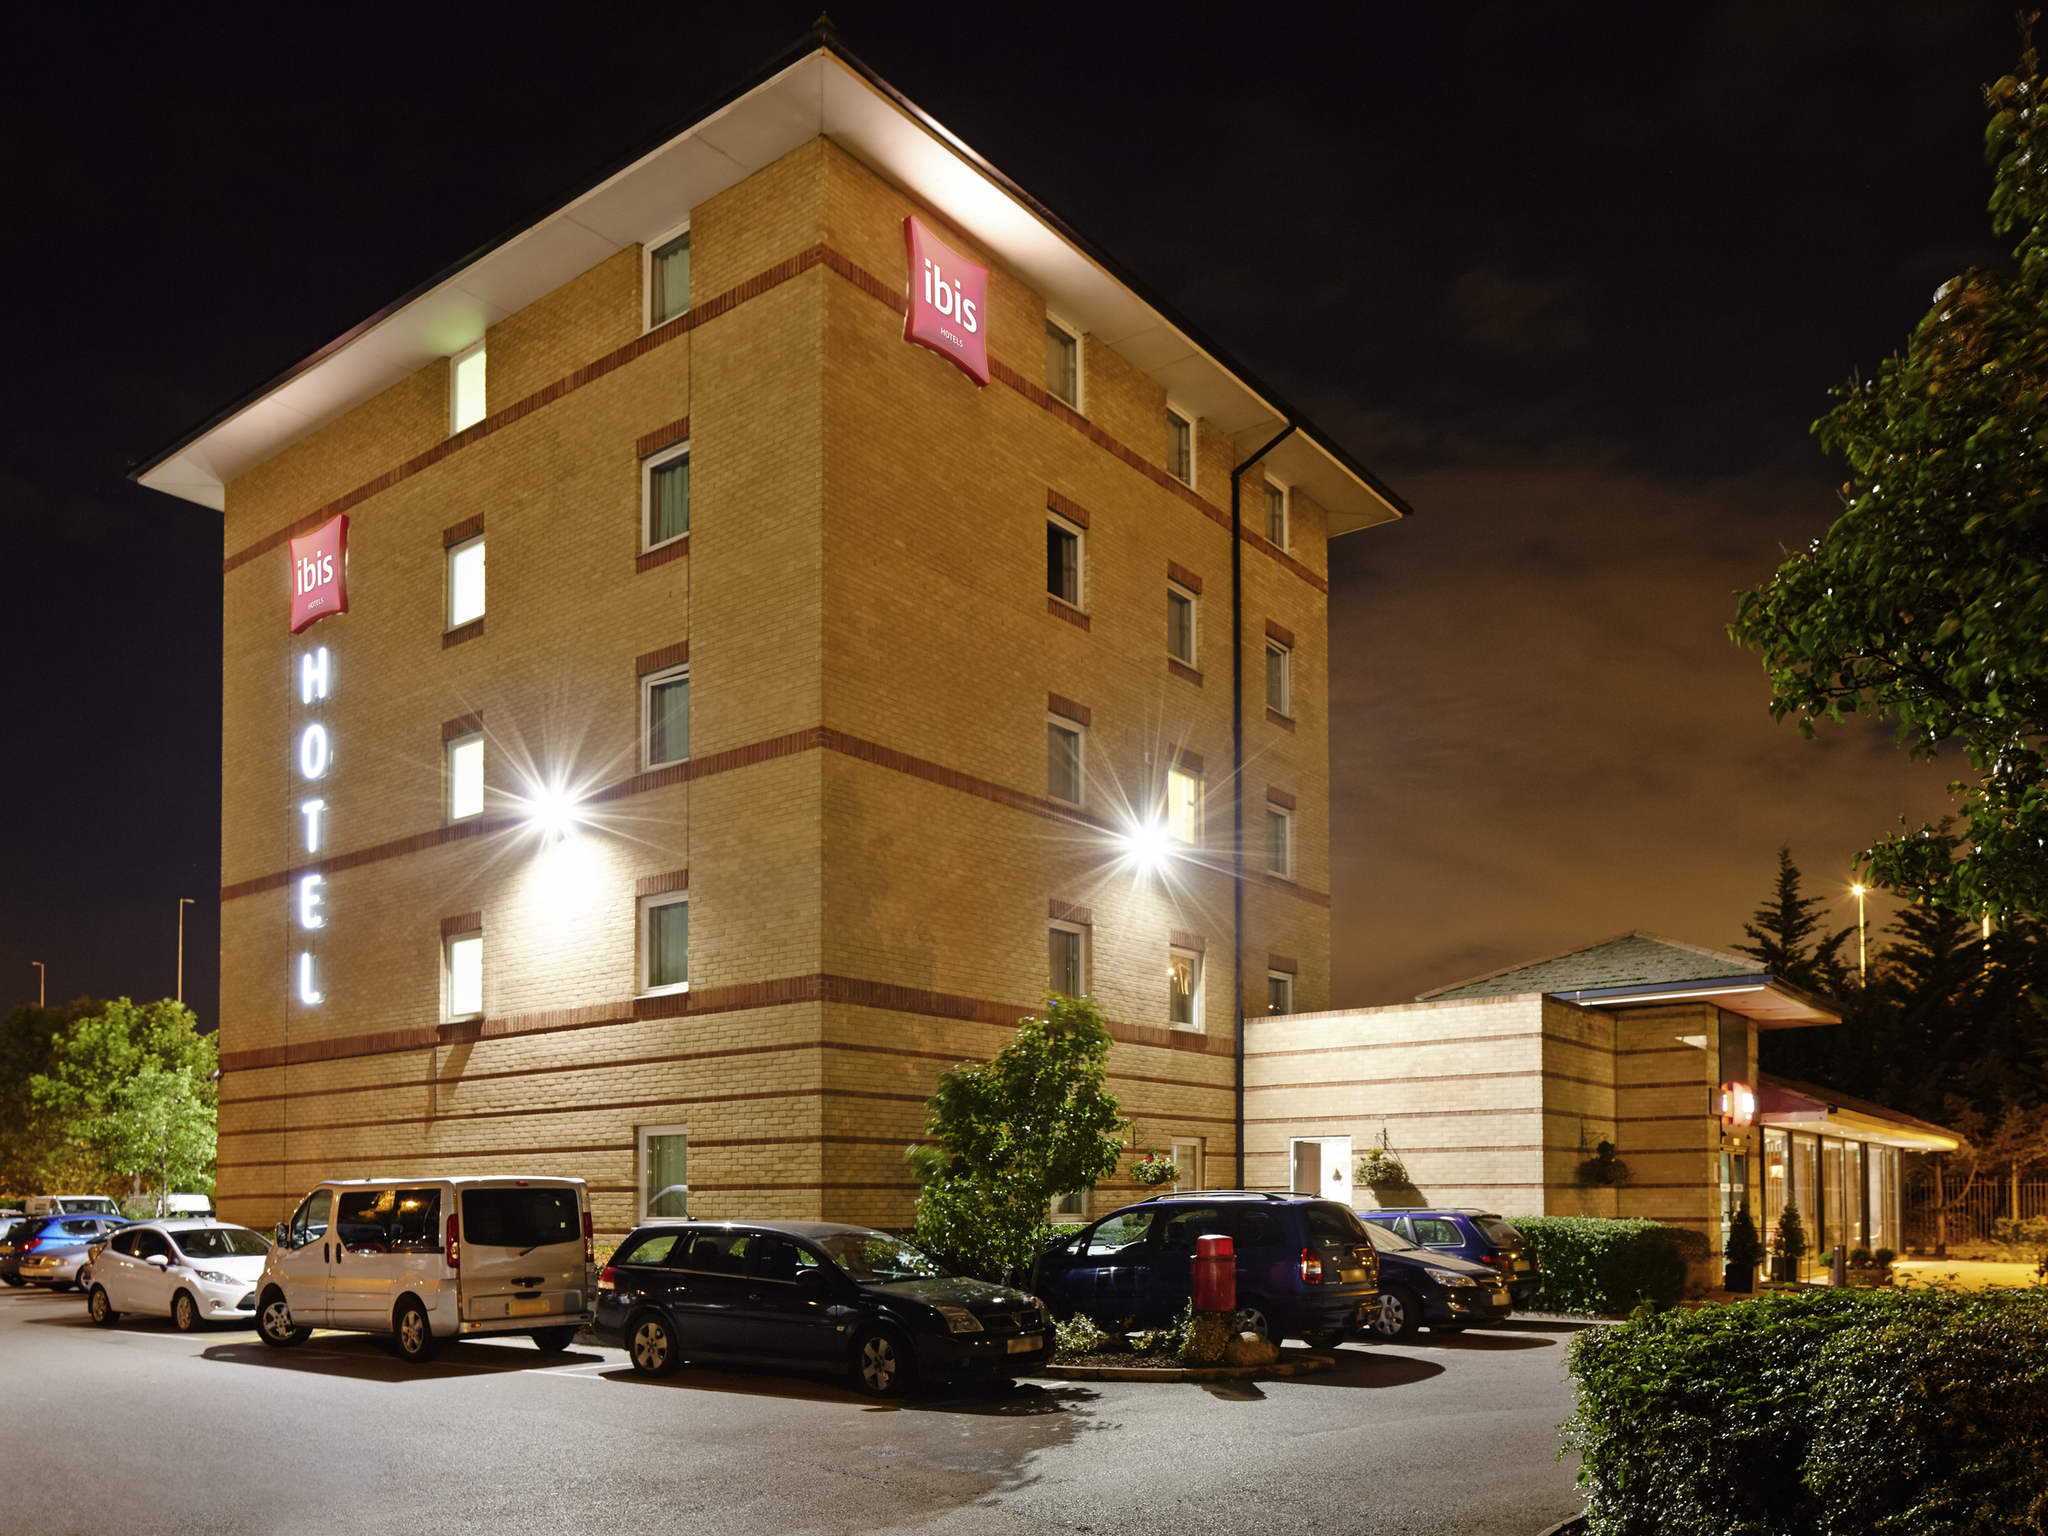 Hotel Ibis London Thurrock M